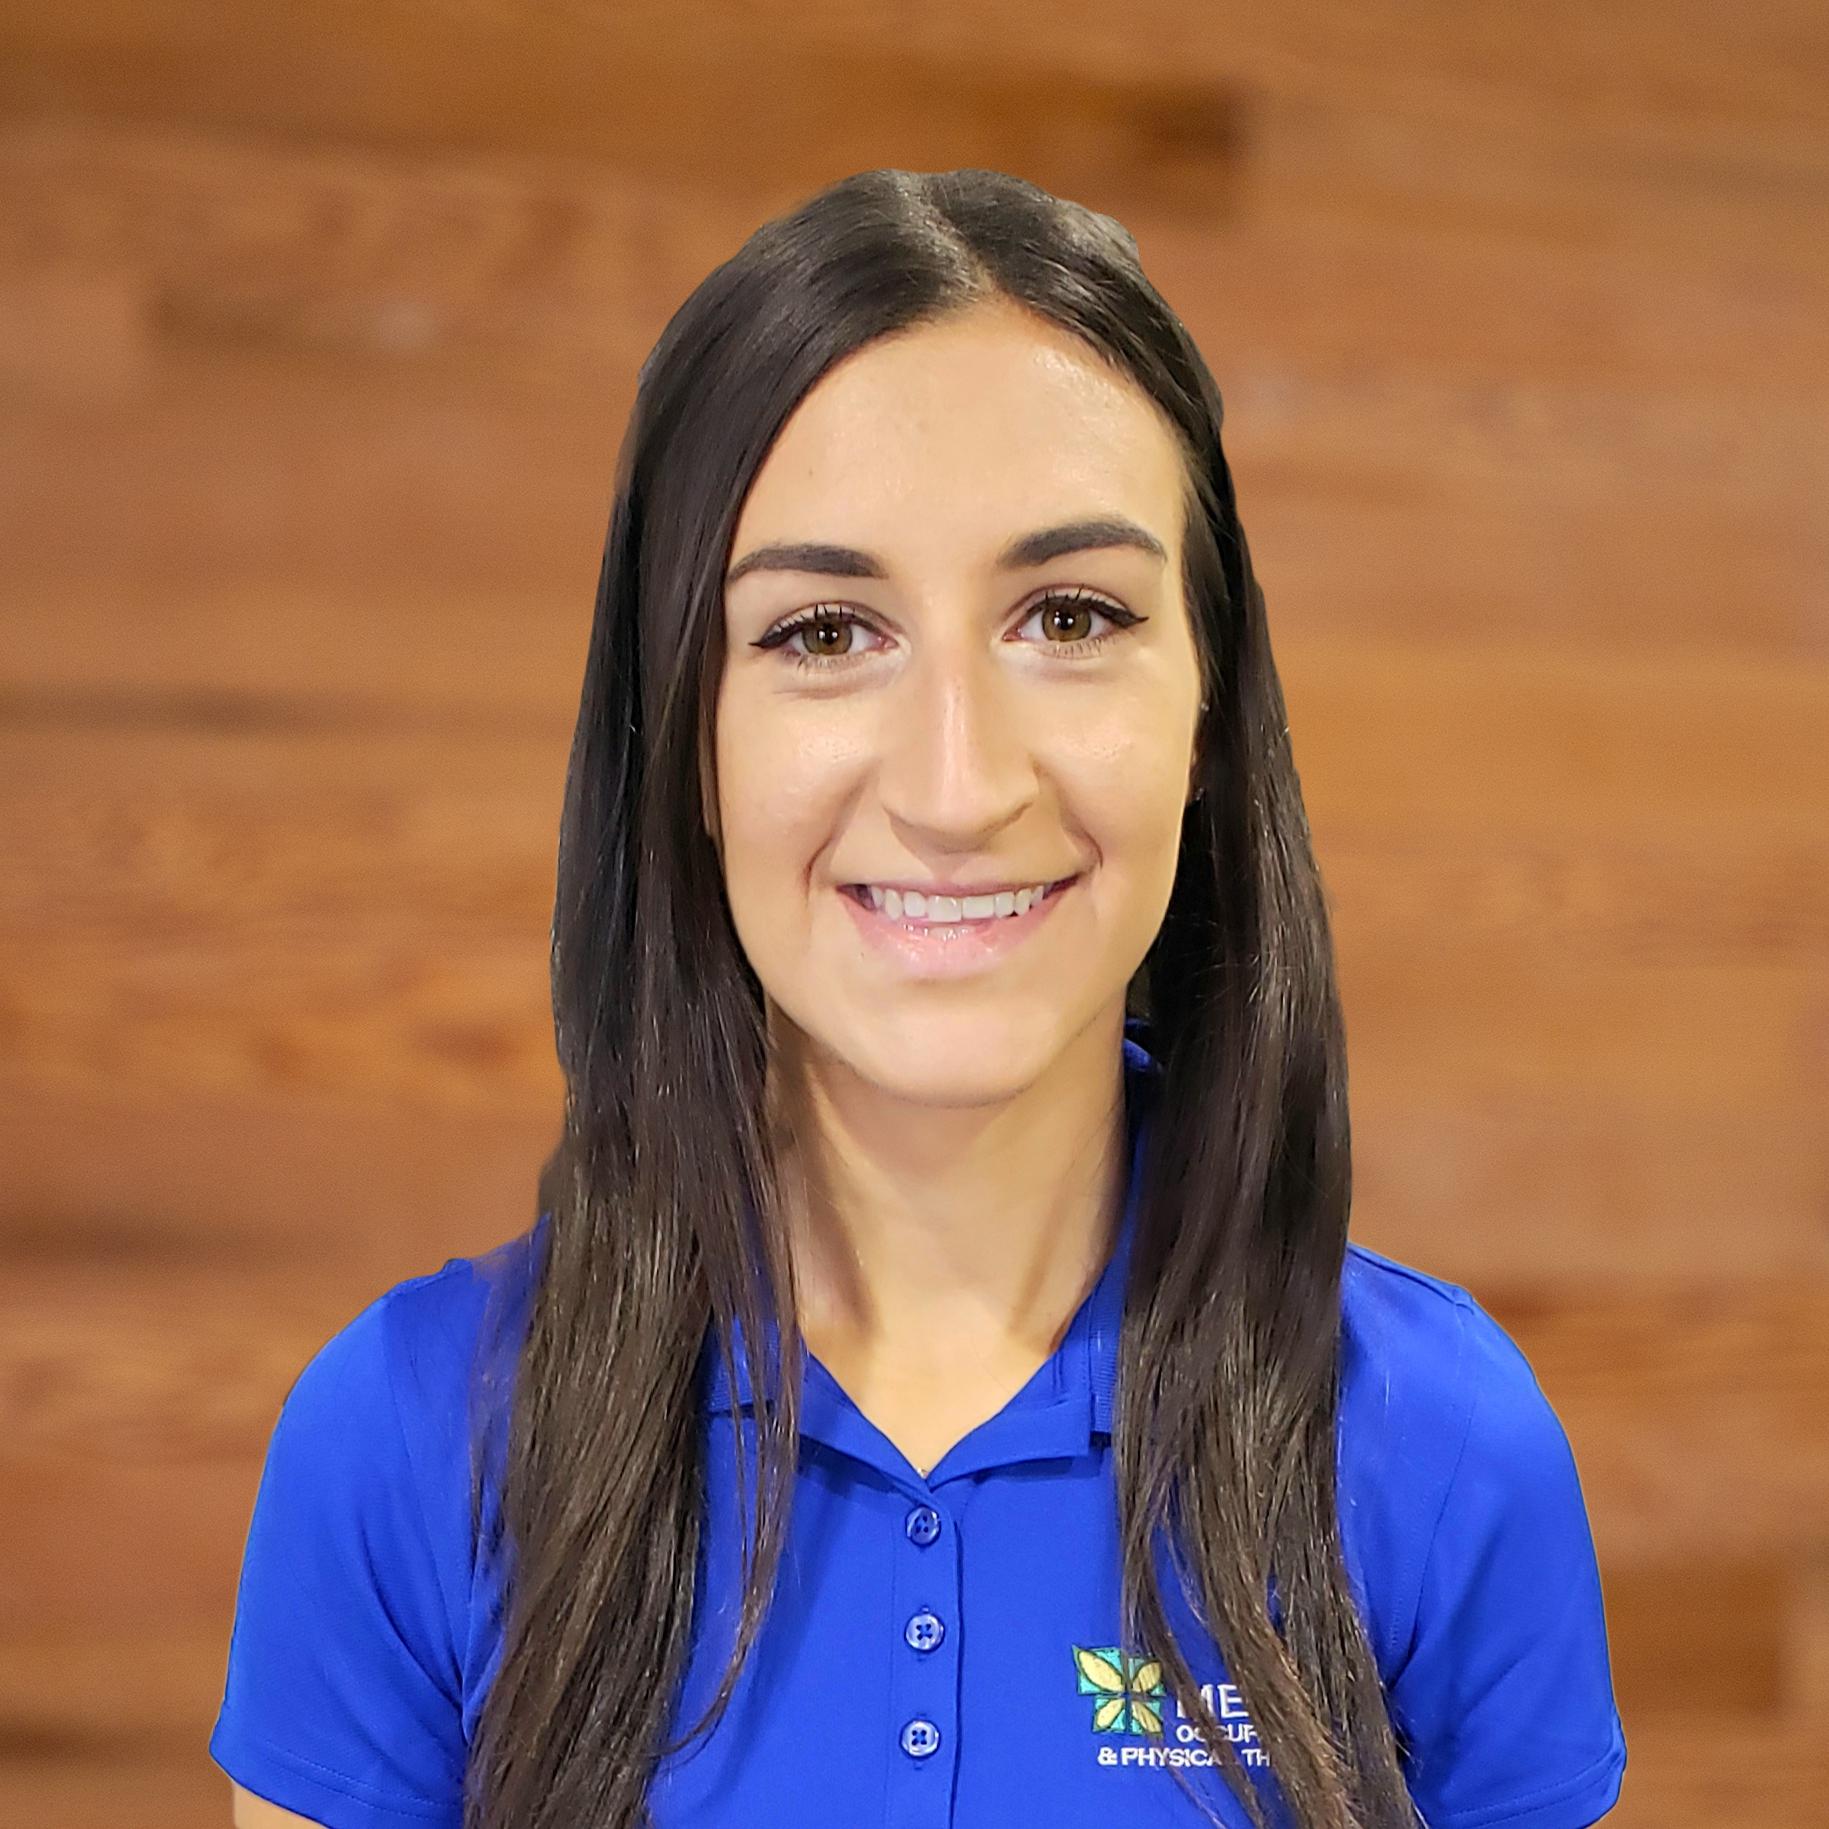 Katarina Narouz is a Physical Therapist in Port Jefferson, NY